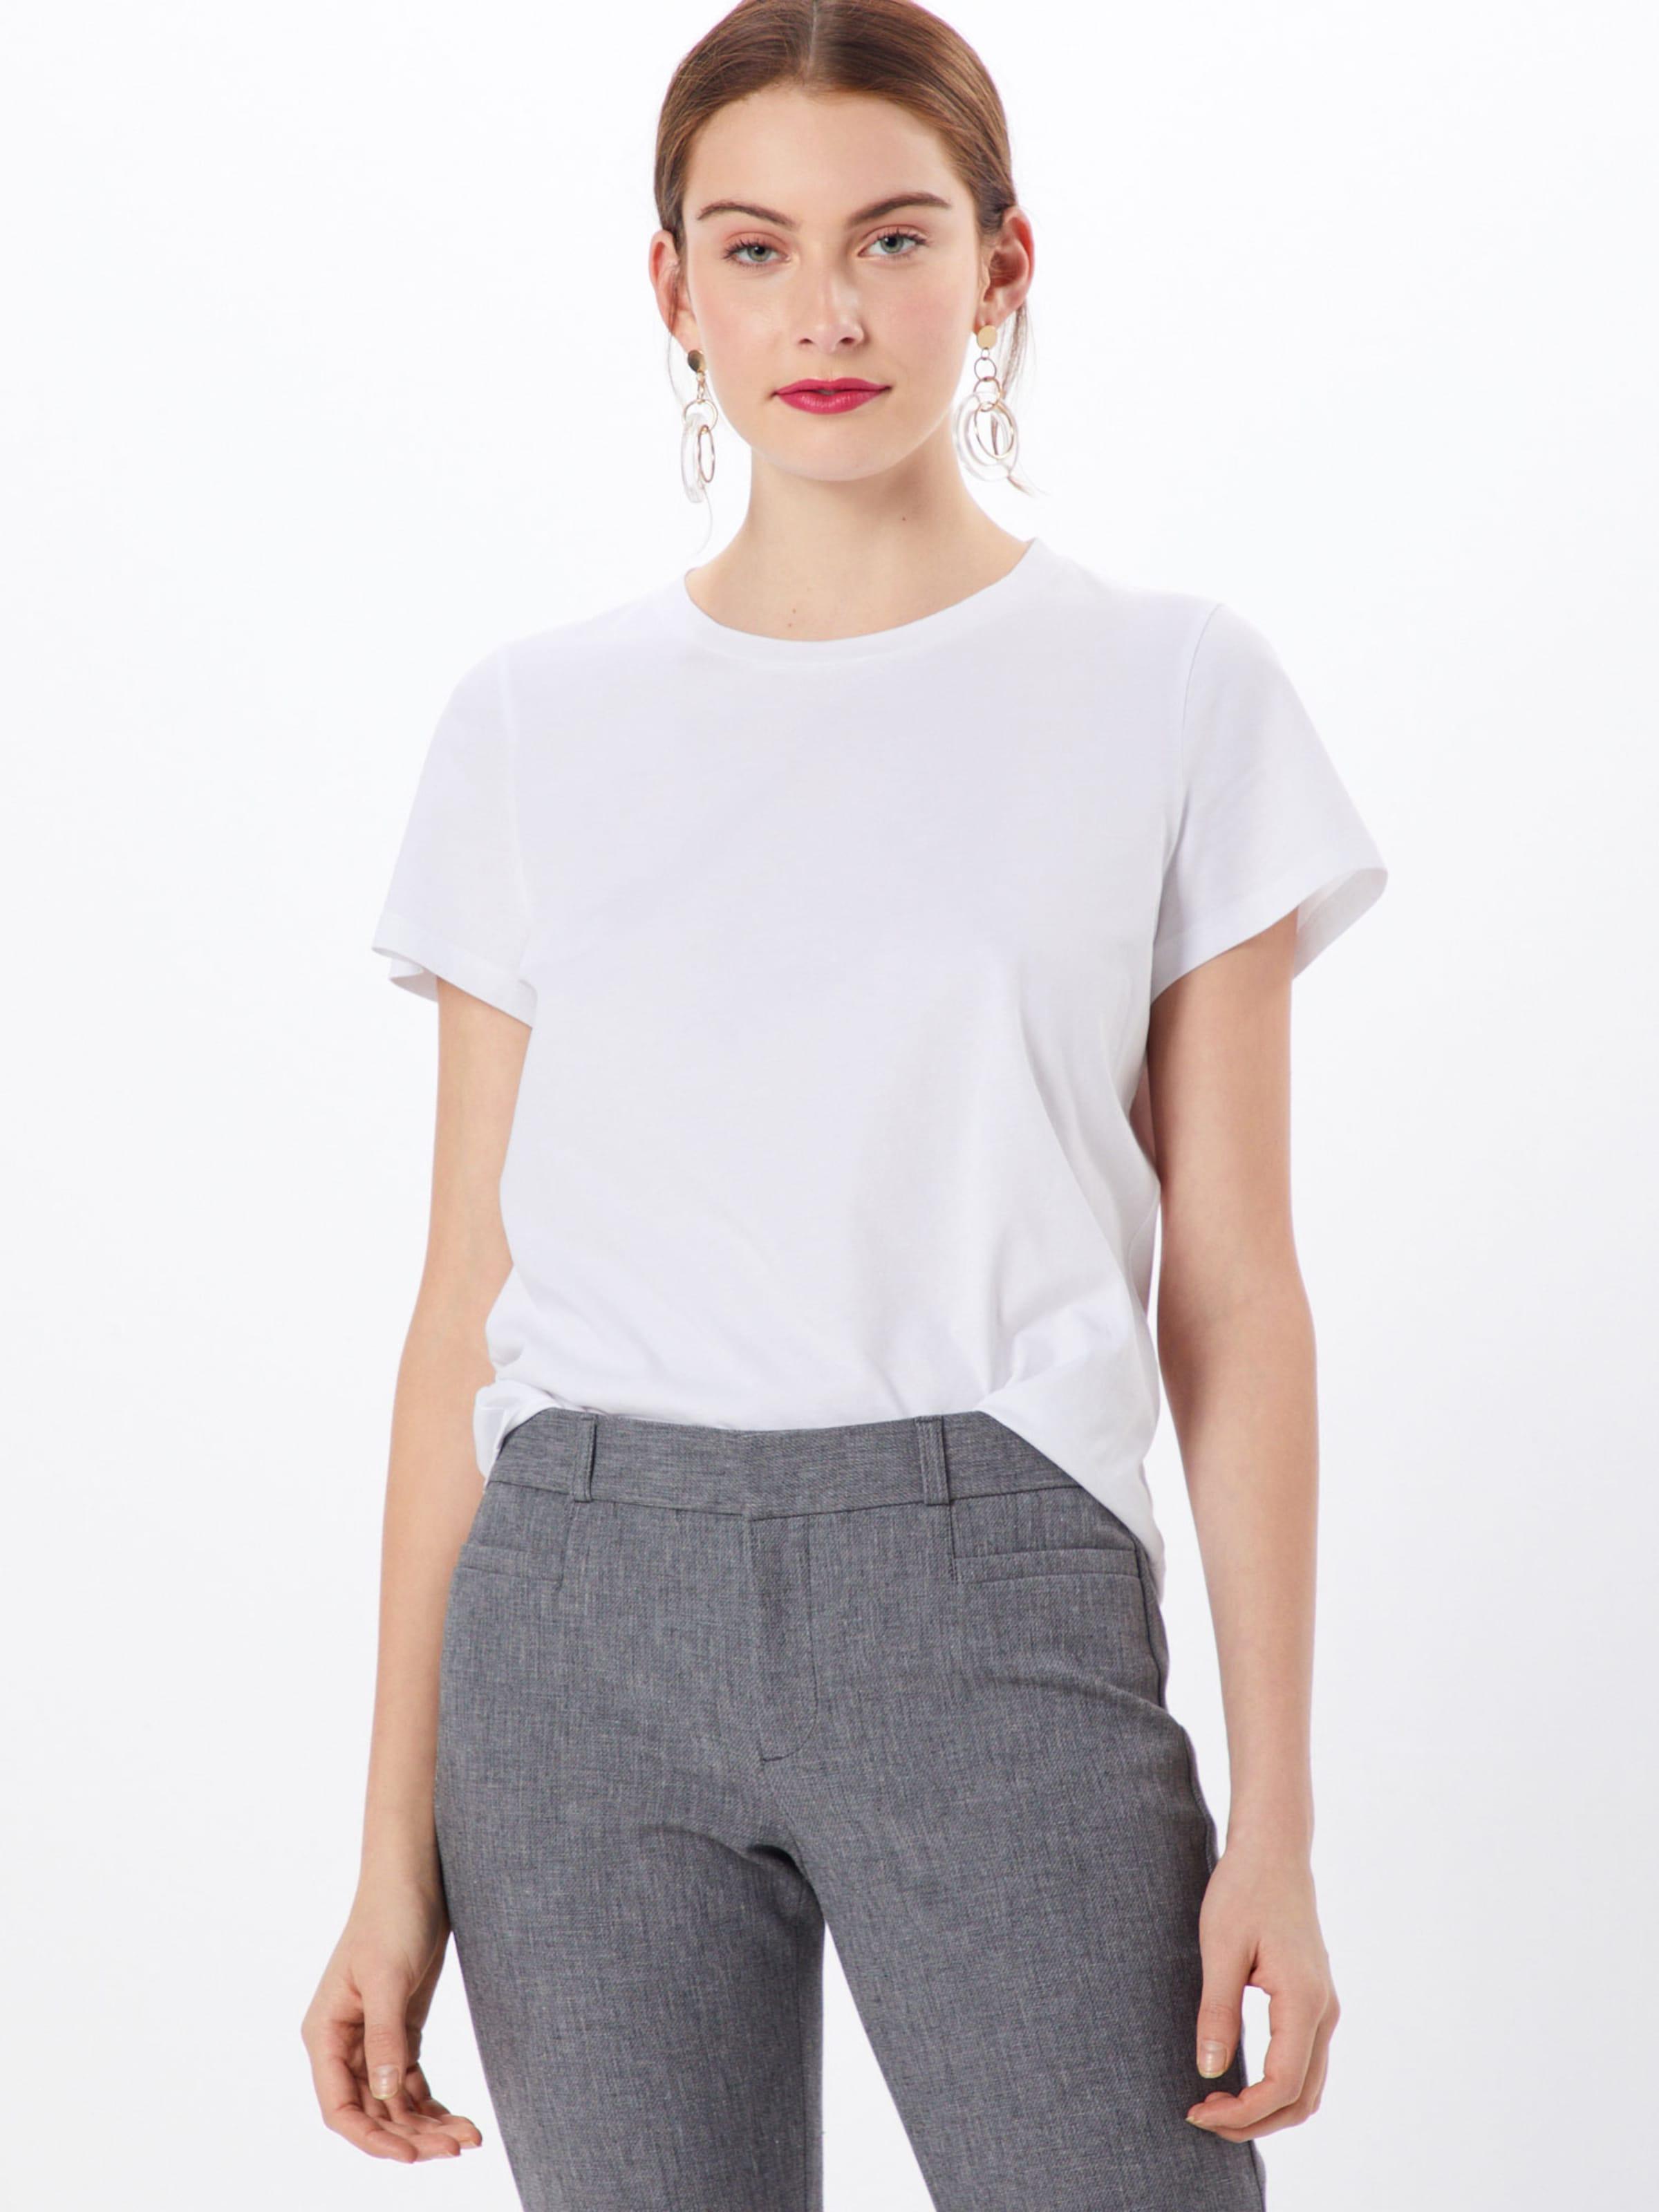 T Banana Supima Crew Relaunch' En Republic shirt 'ss Blanc cARjL354q